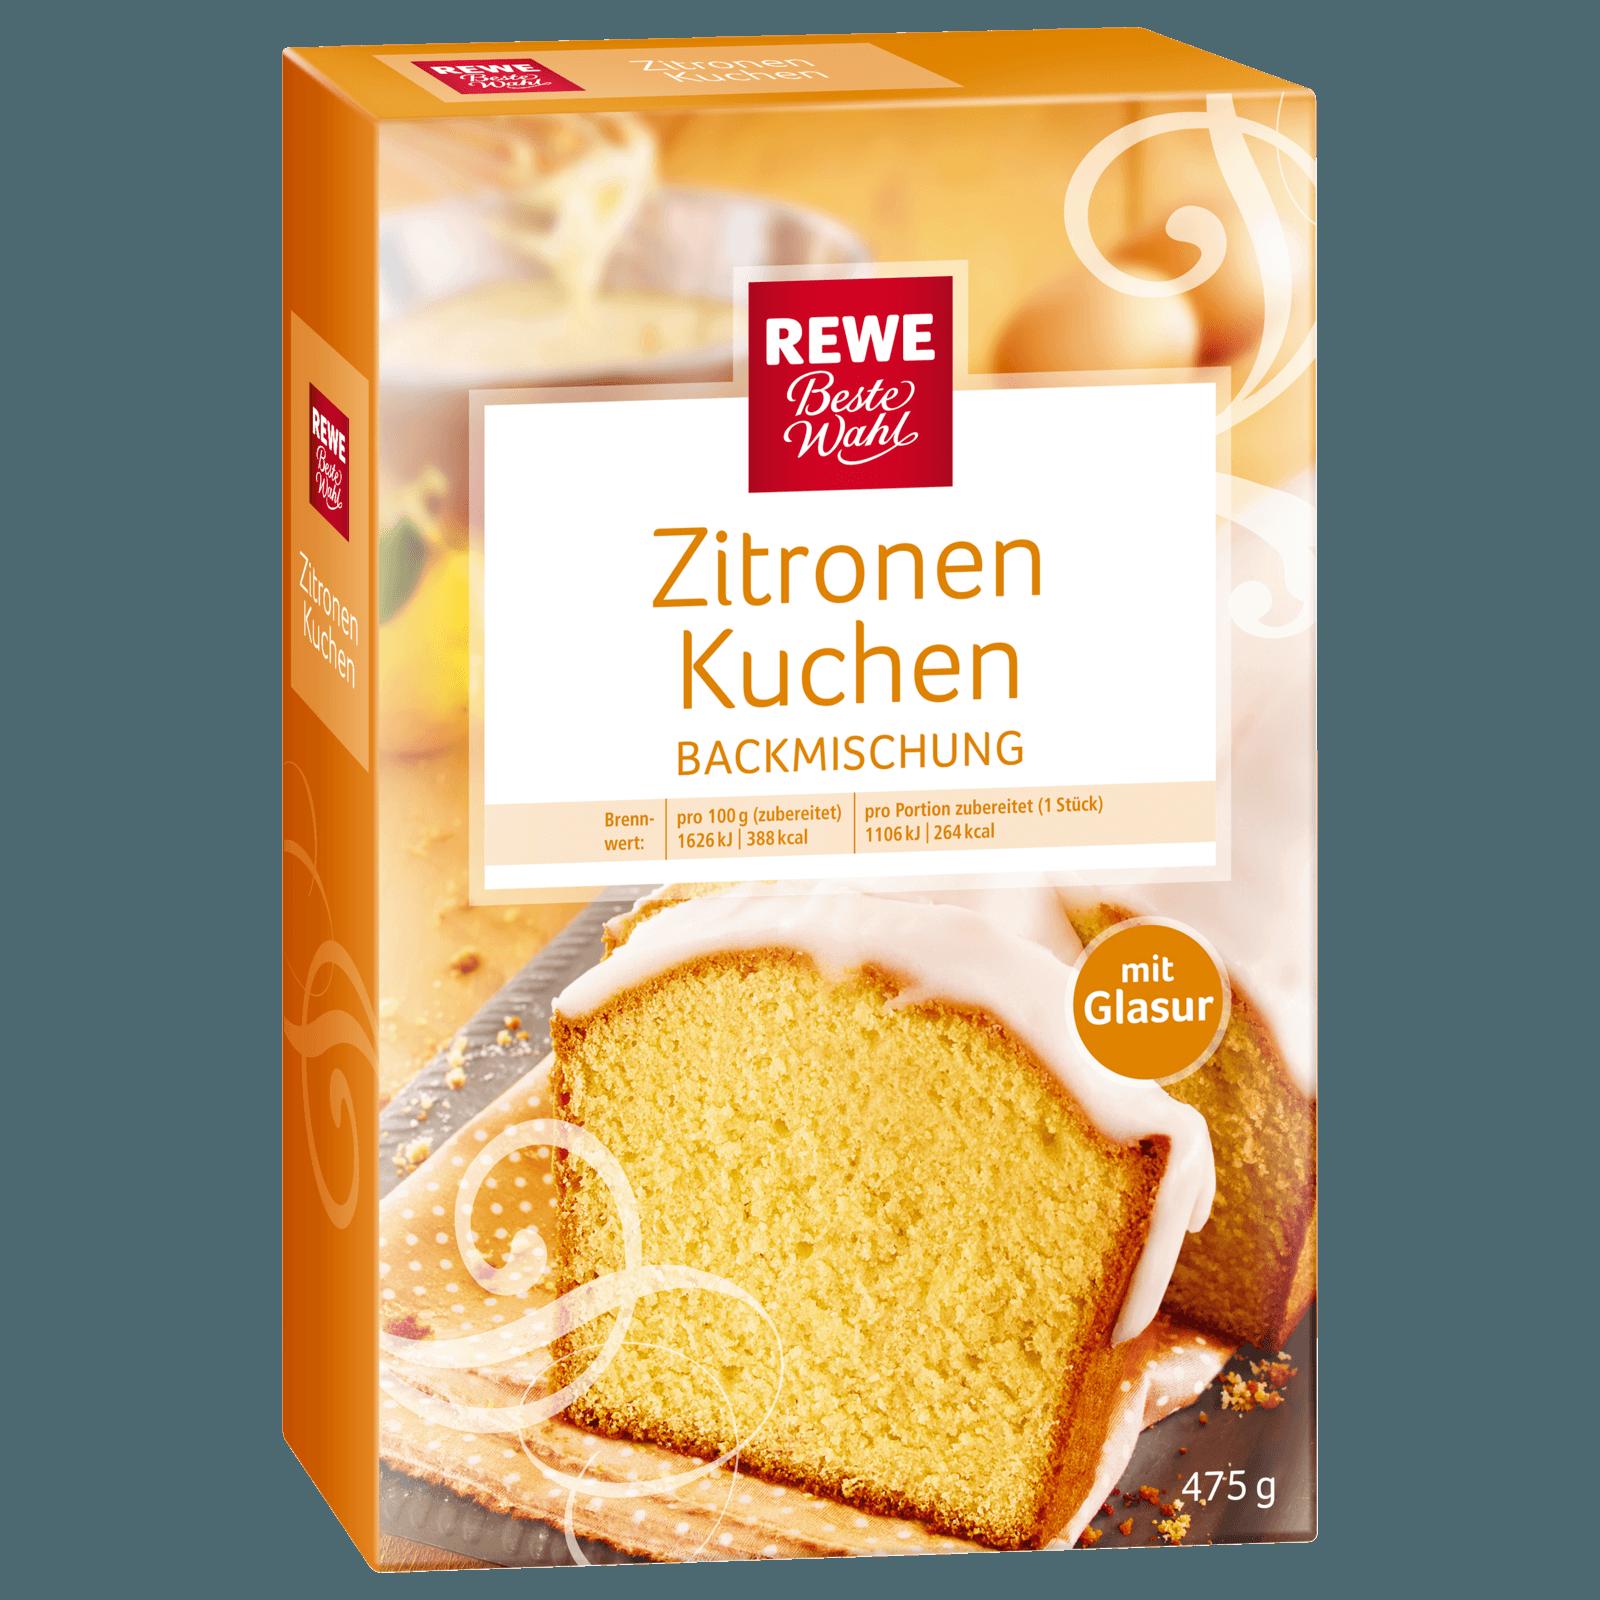 Rewe Beste Wahl Zitronenkuchen Backmischung 475g Bei Rewe Online